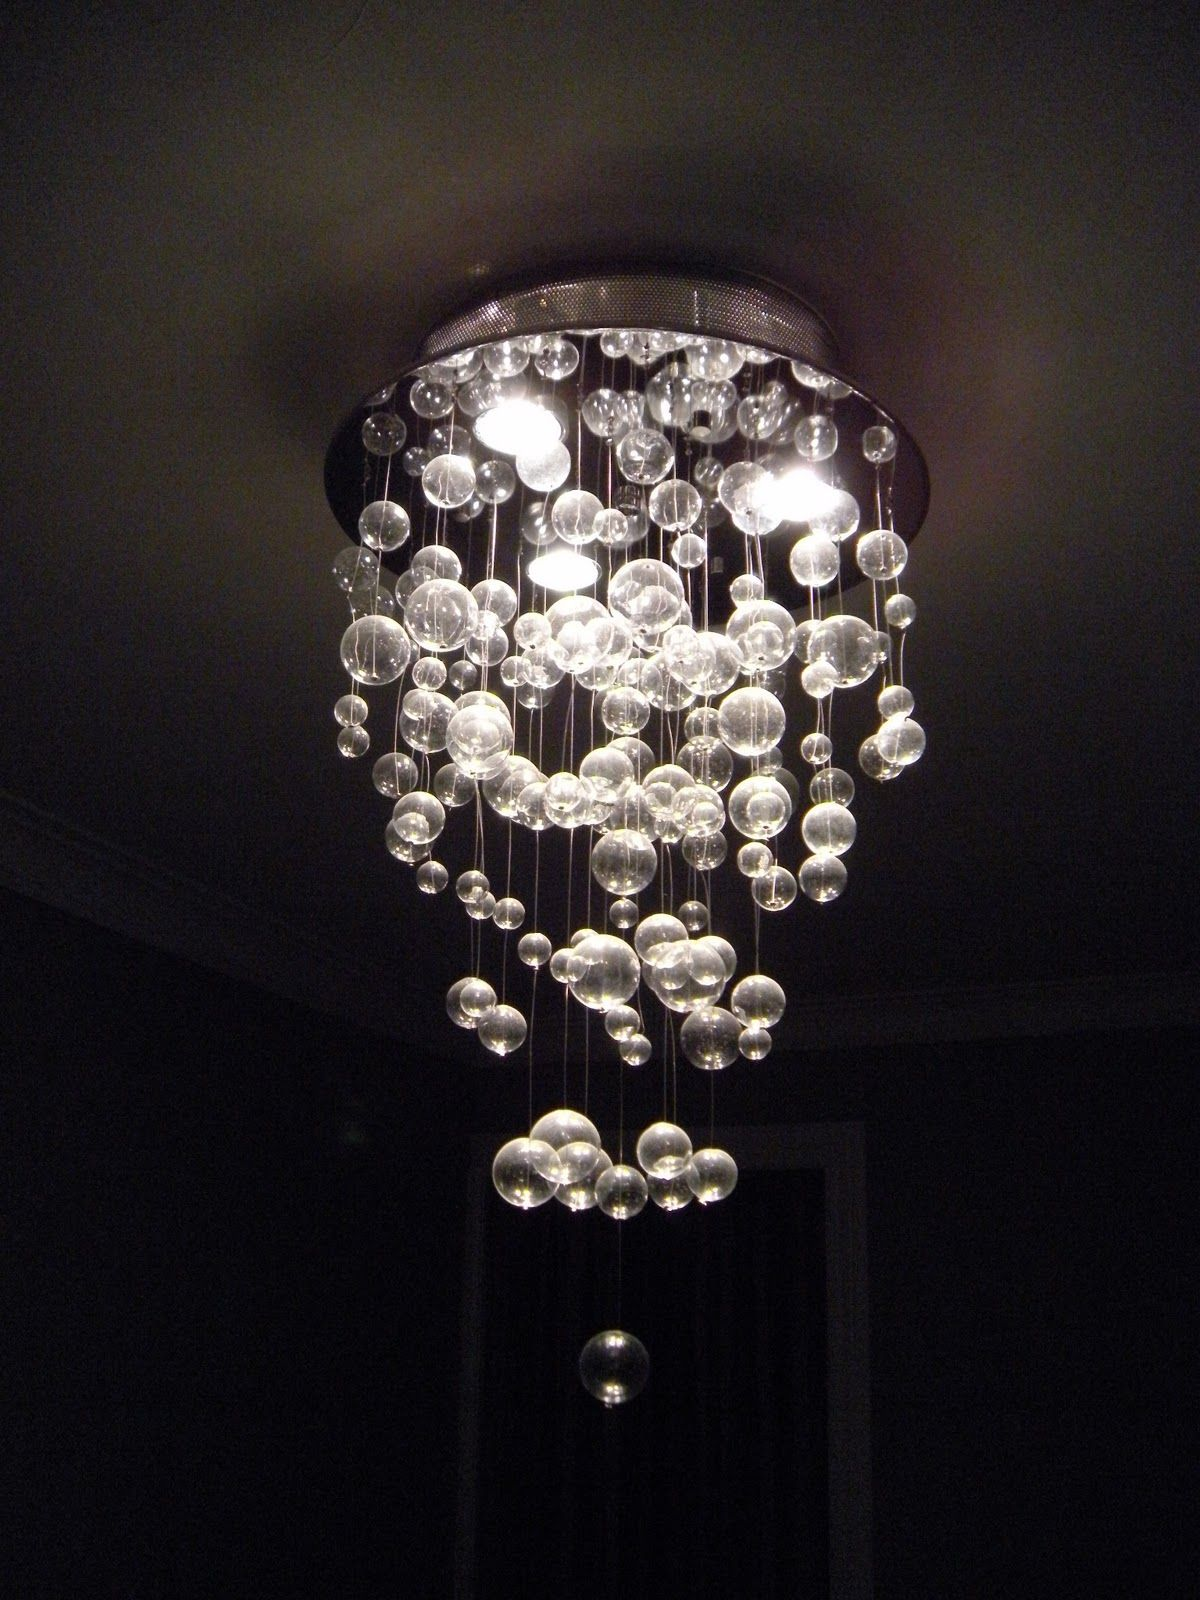 I SOOO want a bubble chandelier over my bathtub!!! | Decor Ideas ...